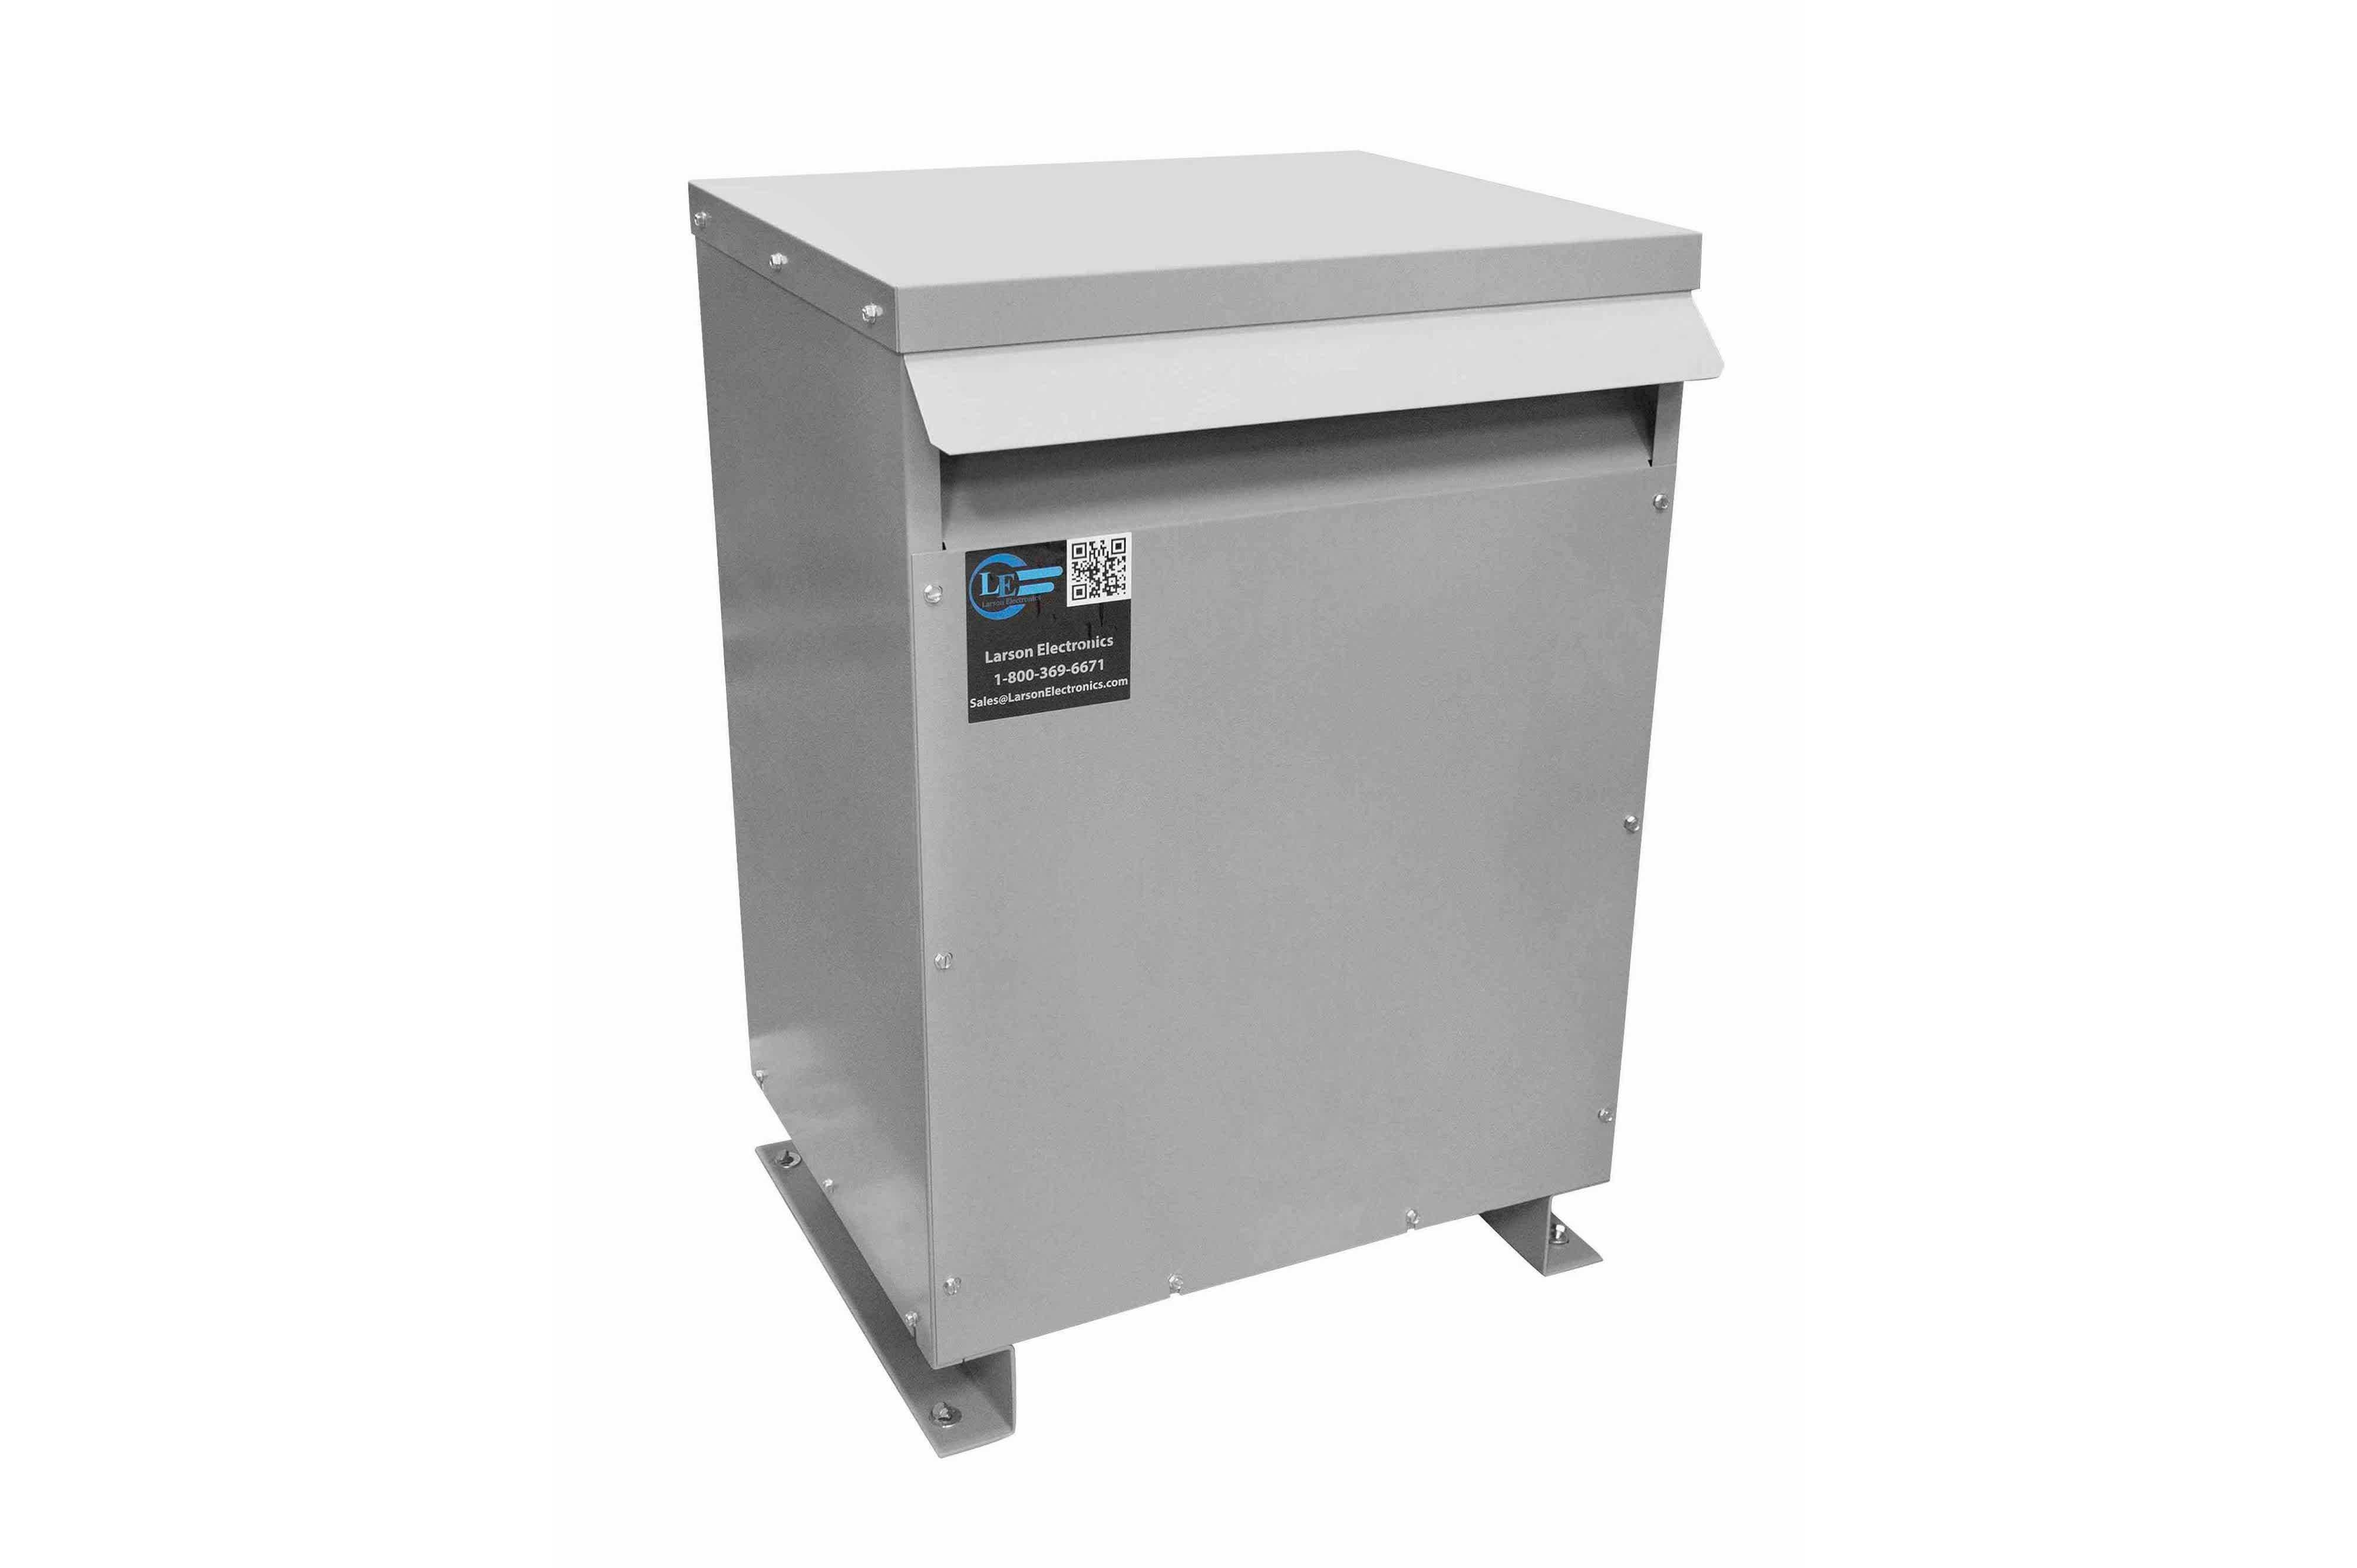 167 kVA 3PH Isolation Transformer, 240V Wye Primary, 400Y/231 Wye-N Secondary, N3R, Ventilated, 60 Hz